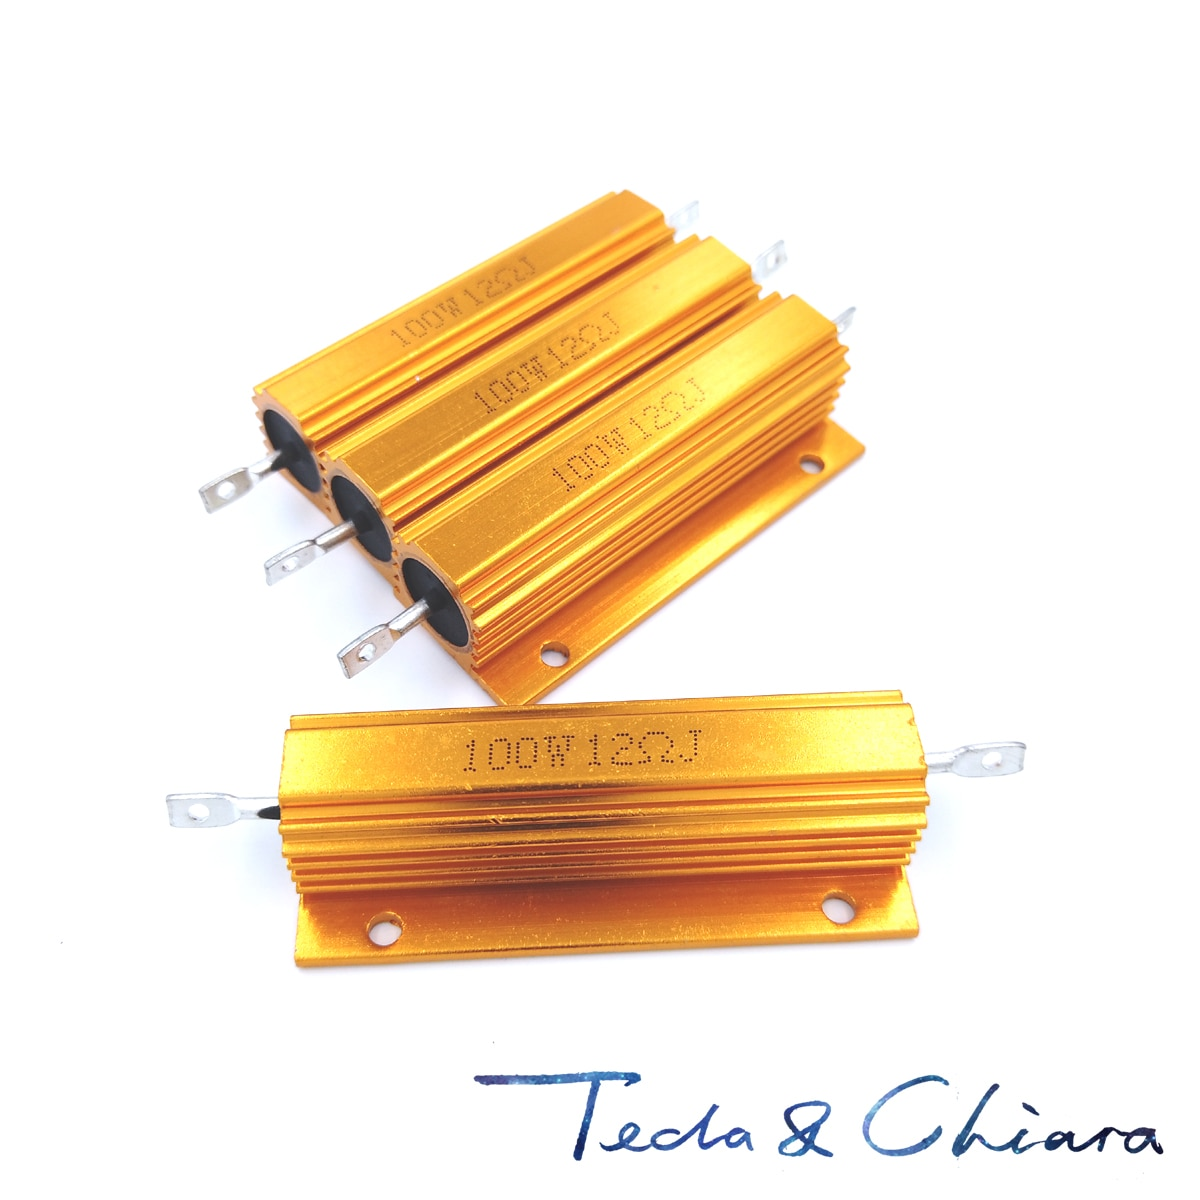 5Pcs 280R 280ohm 280 24R 24ohm 24 R Ohm 100W Watt Aluminum Wirewound Power Metal Shell Case Resistor Resistance RX24